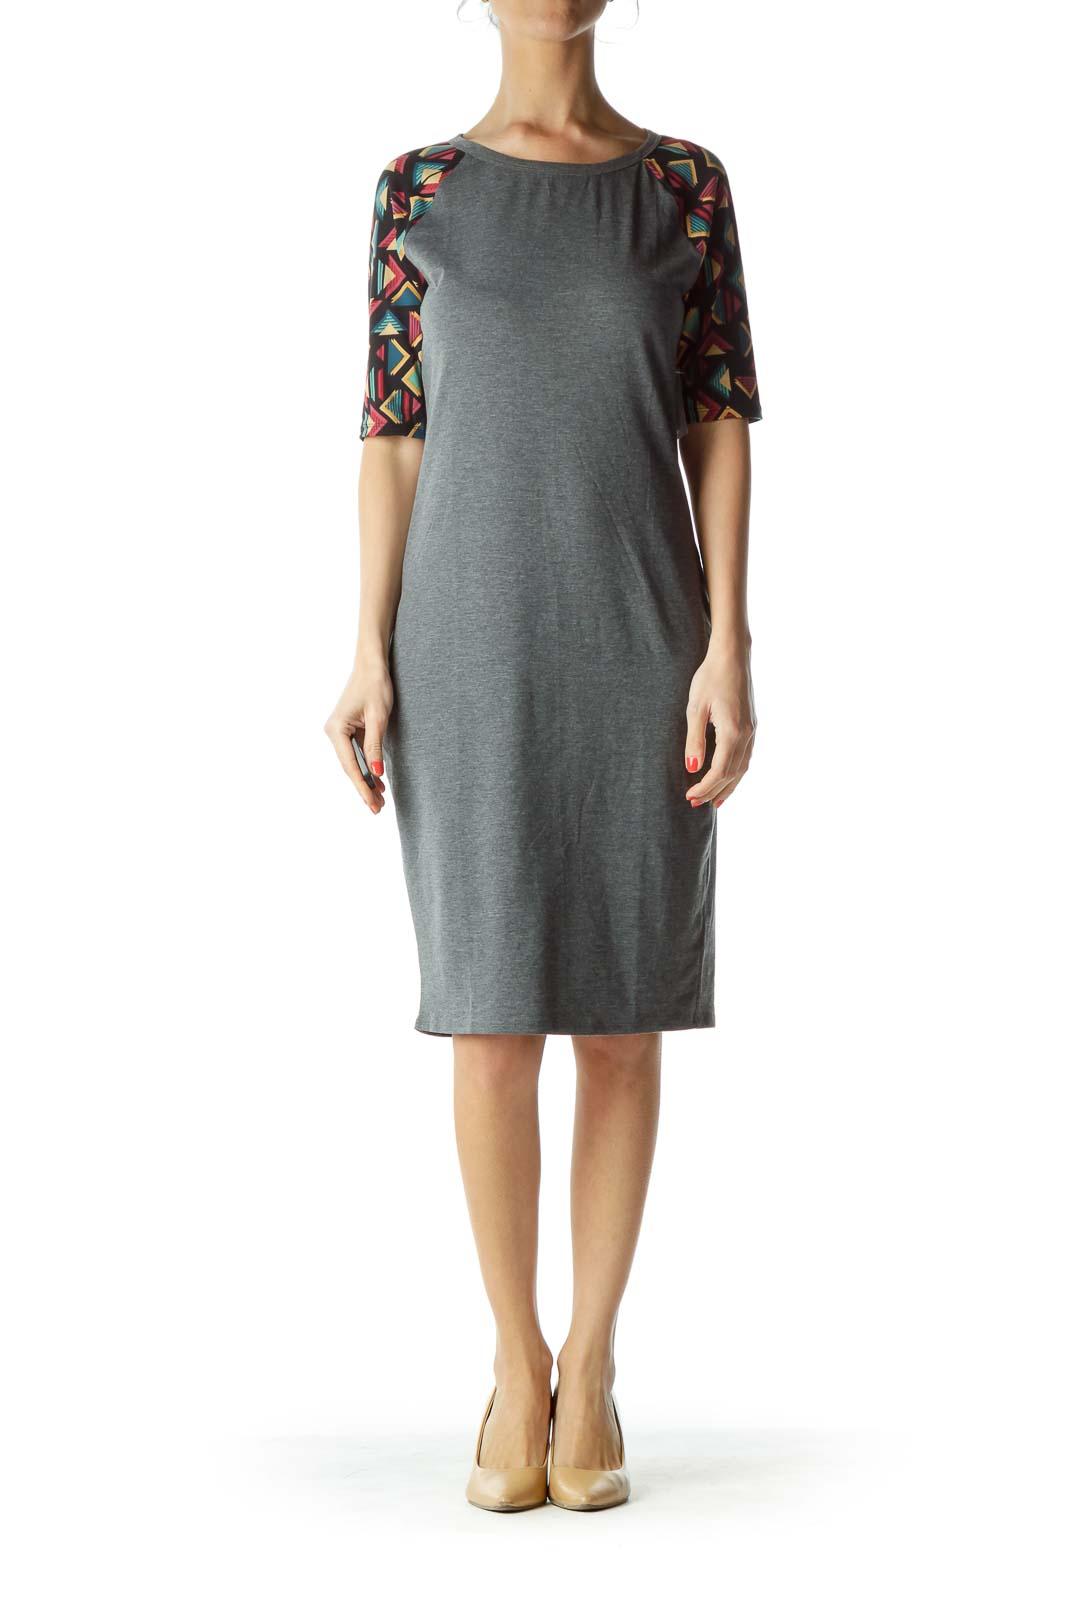 Gray Tribal Print Sleeve Jersey Dress